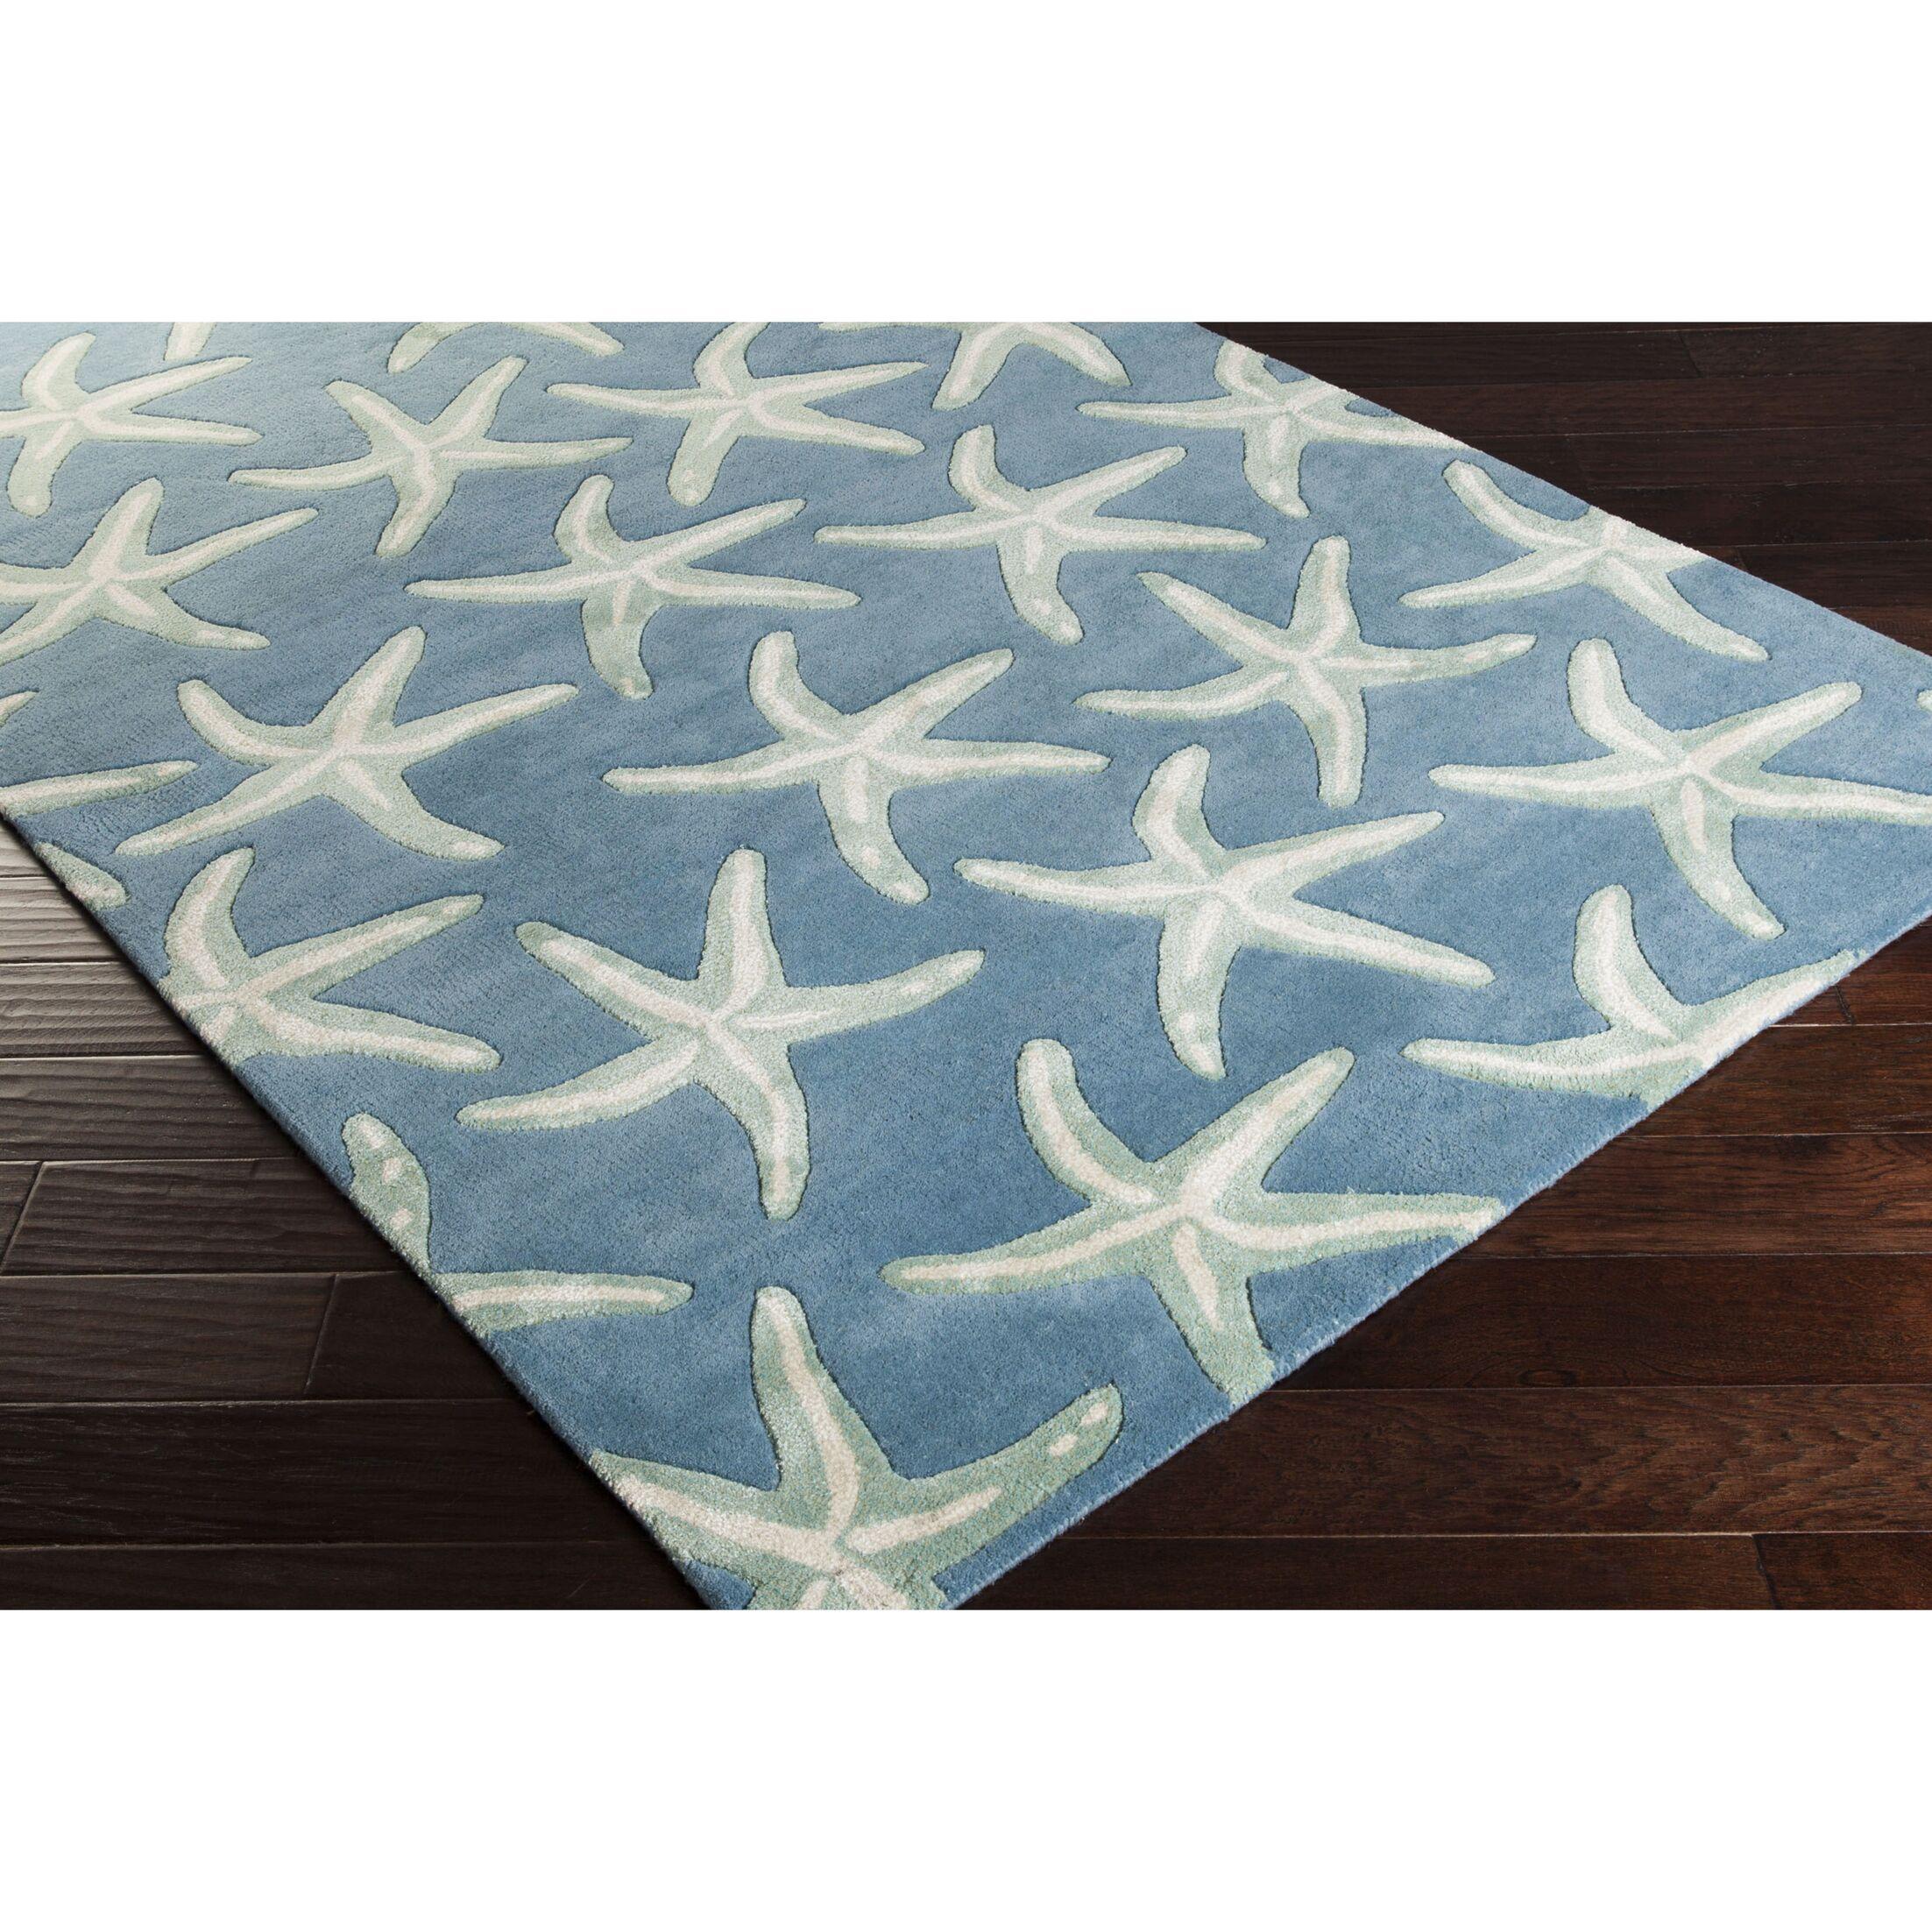 Clare Hand-Tufted Denim/Khaki Area Rug Rug Size: Rectangle 5' x 8'